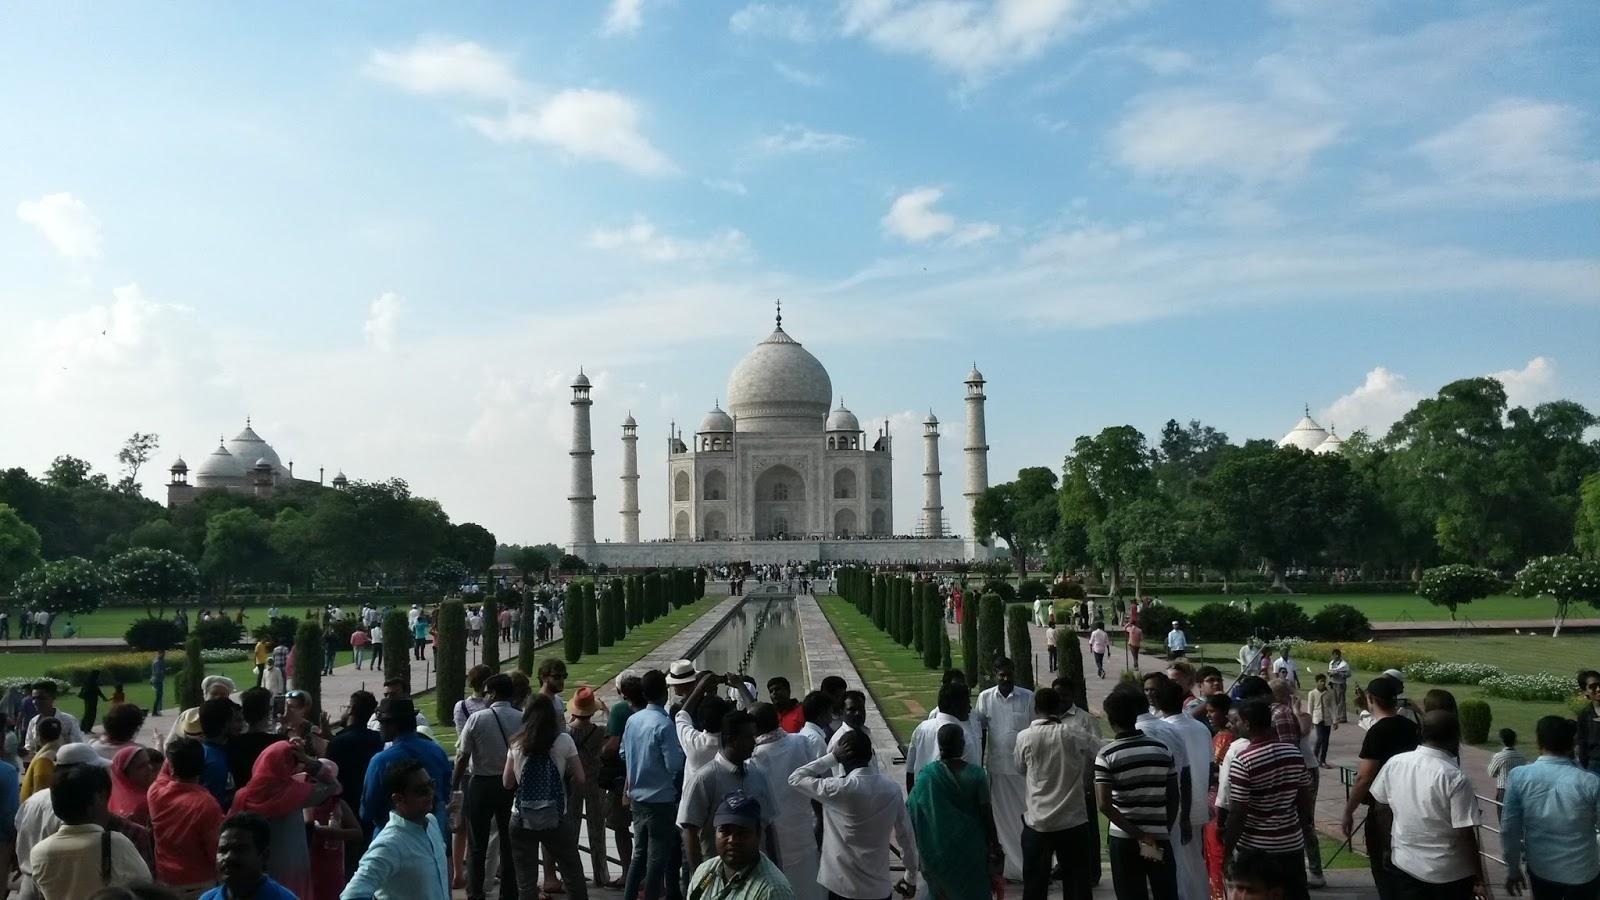 Maj Mahal Mac Mahal India Hindistan Agra